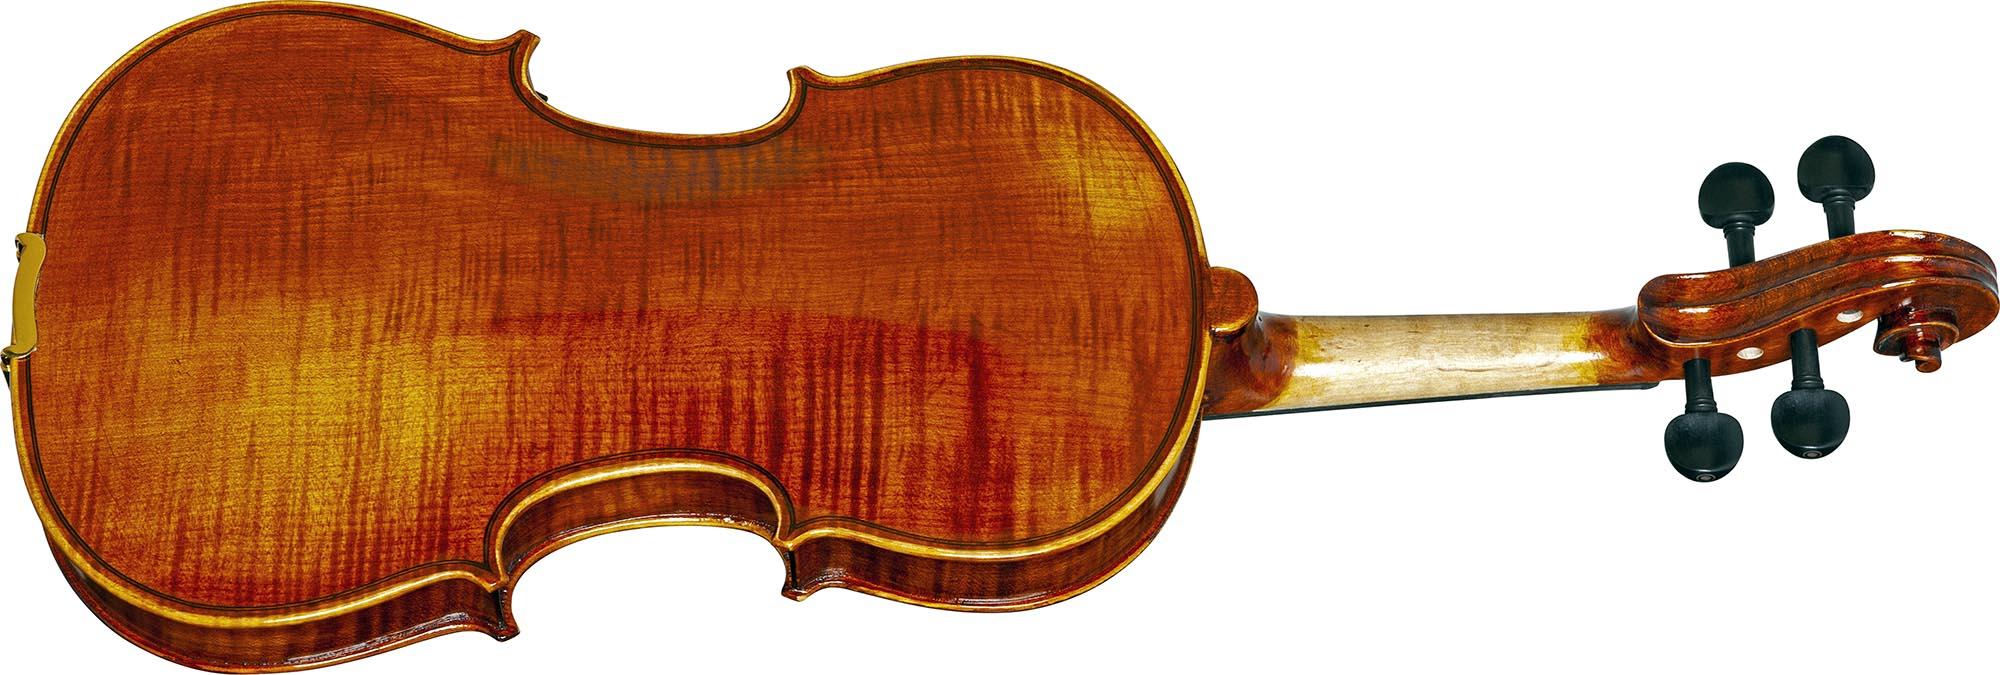 vk544 violino eagle vk544 visao posterior